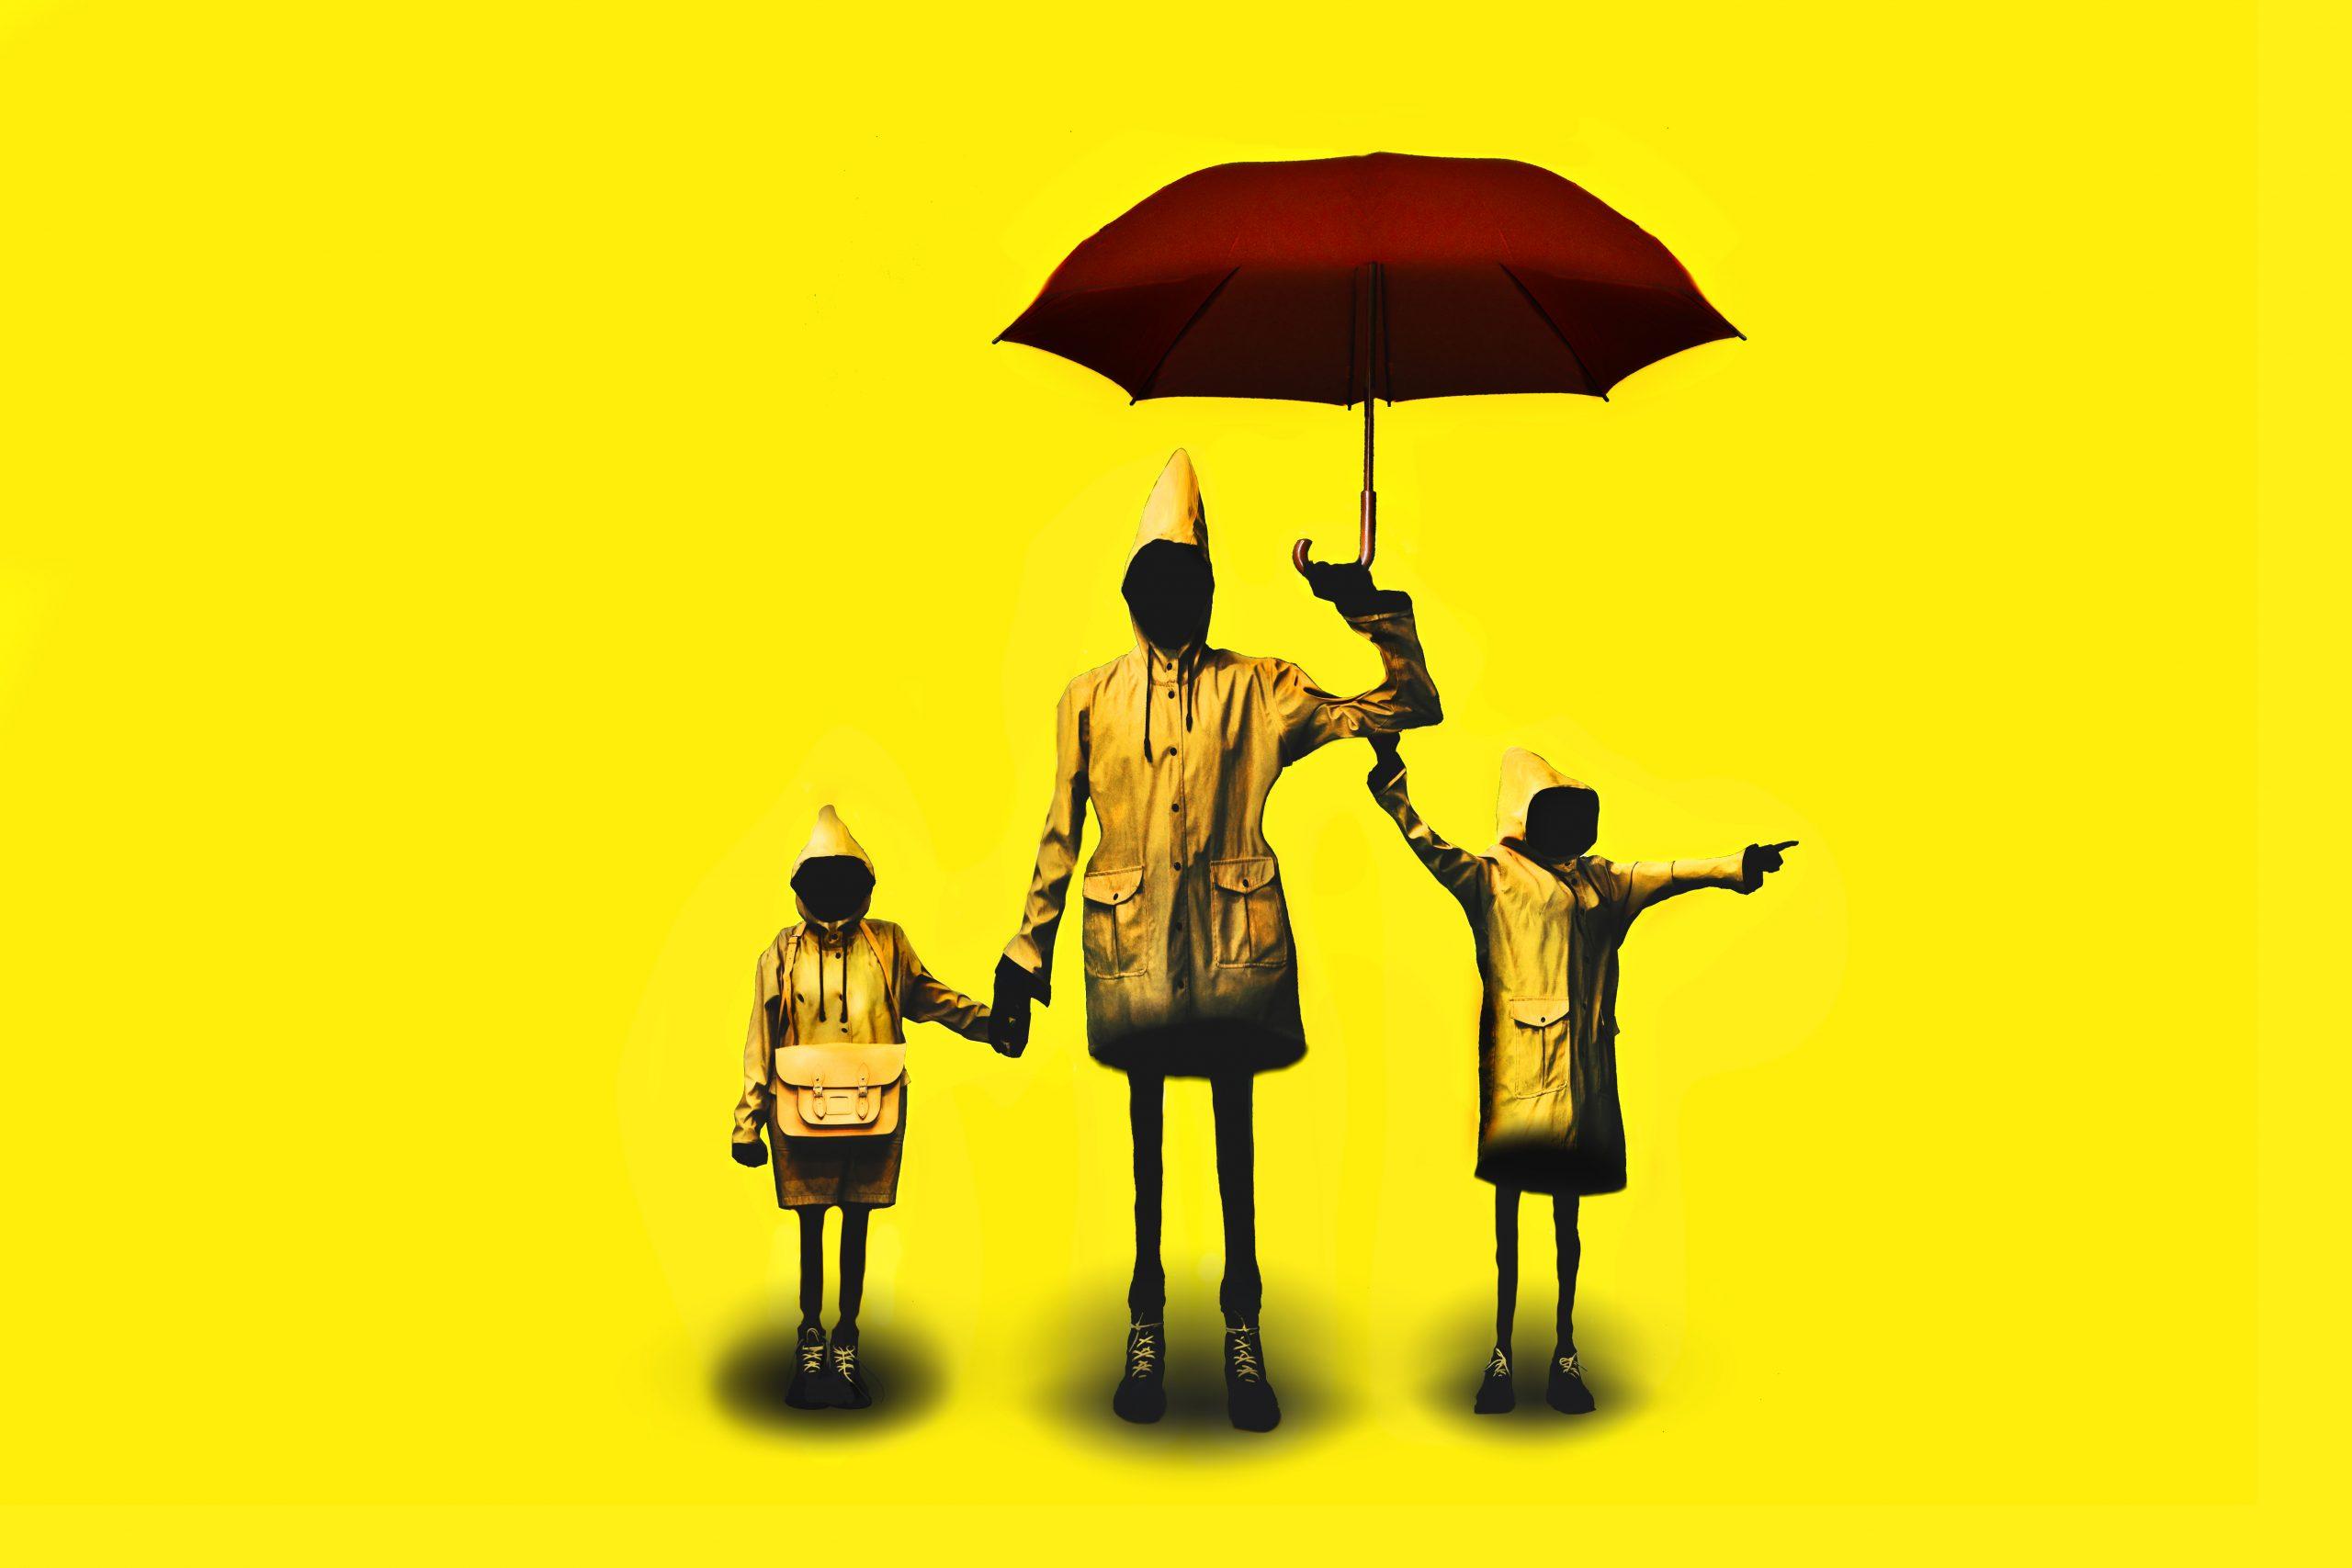 Jakk Breedon's 'Yellow' -  BA (Hons) Creative Media